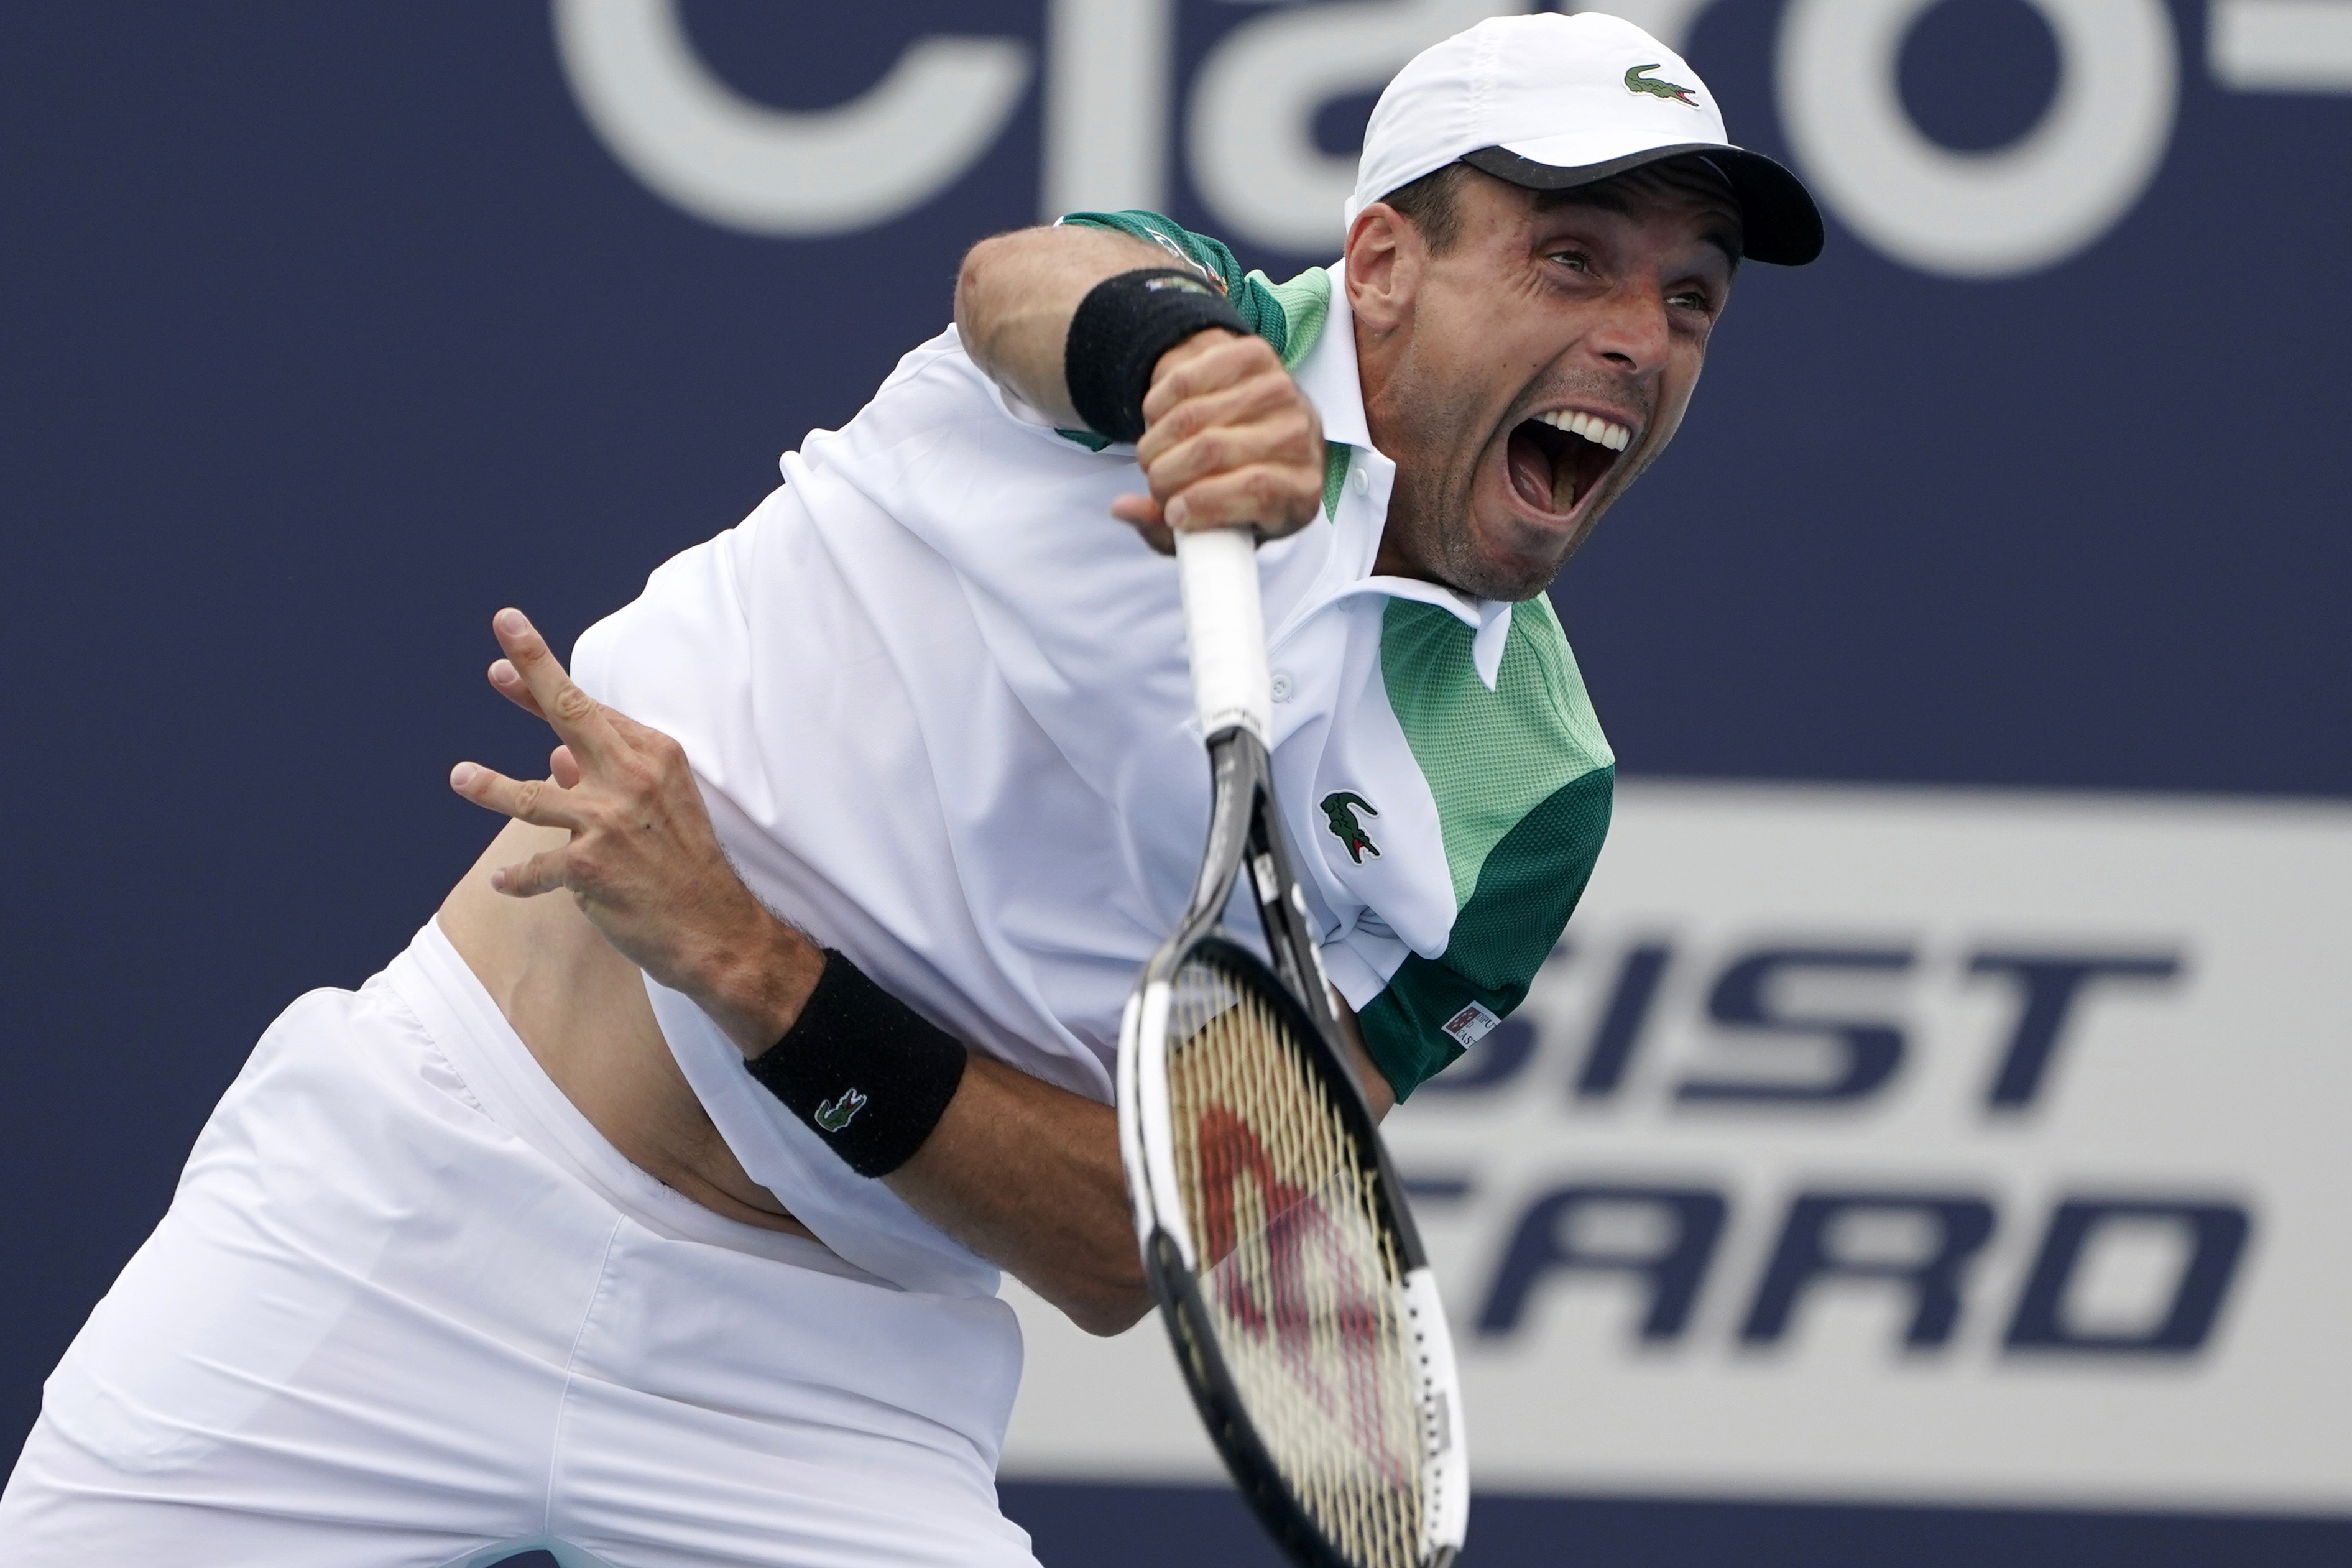 Miami Open 2021: Roberto Bautista Agut vs. Jannik Sinner Tennis Pick and Prediction